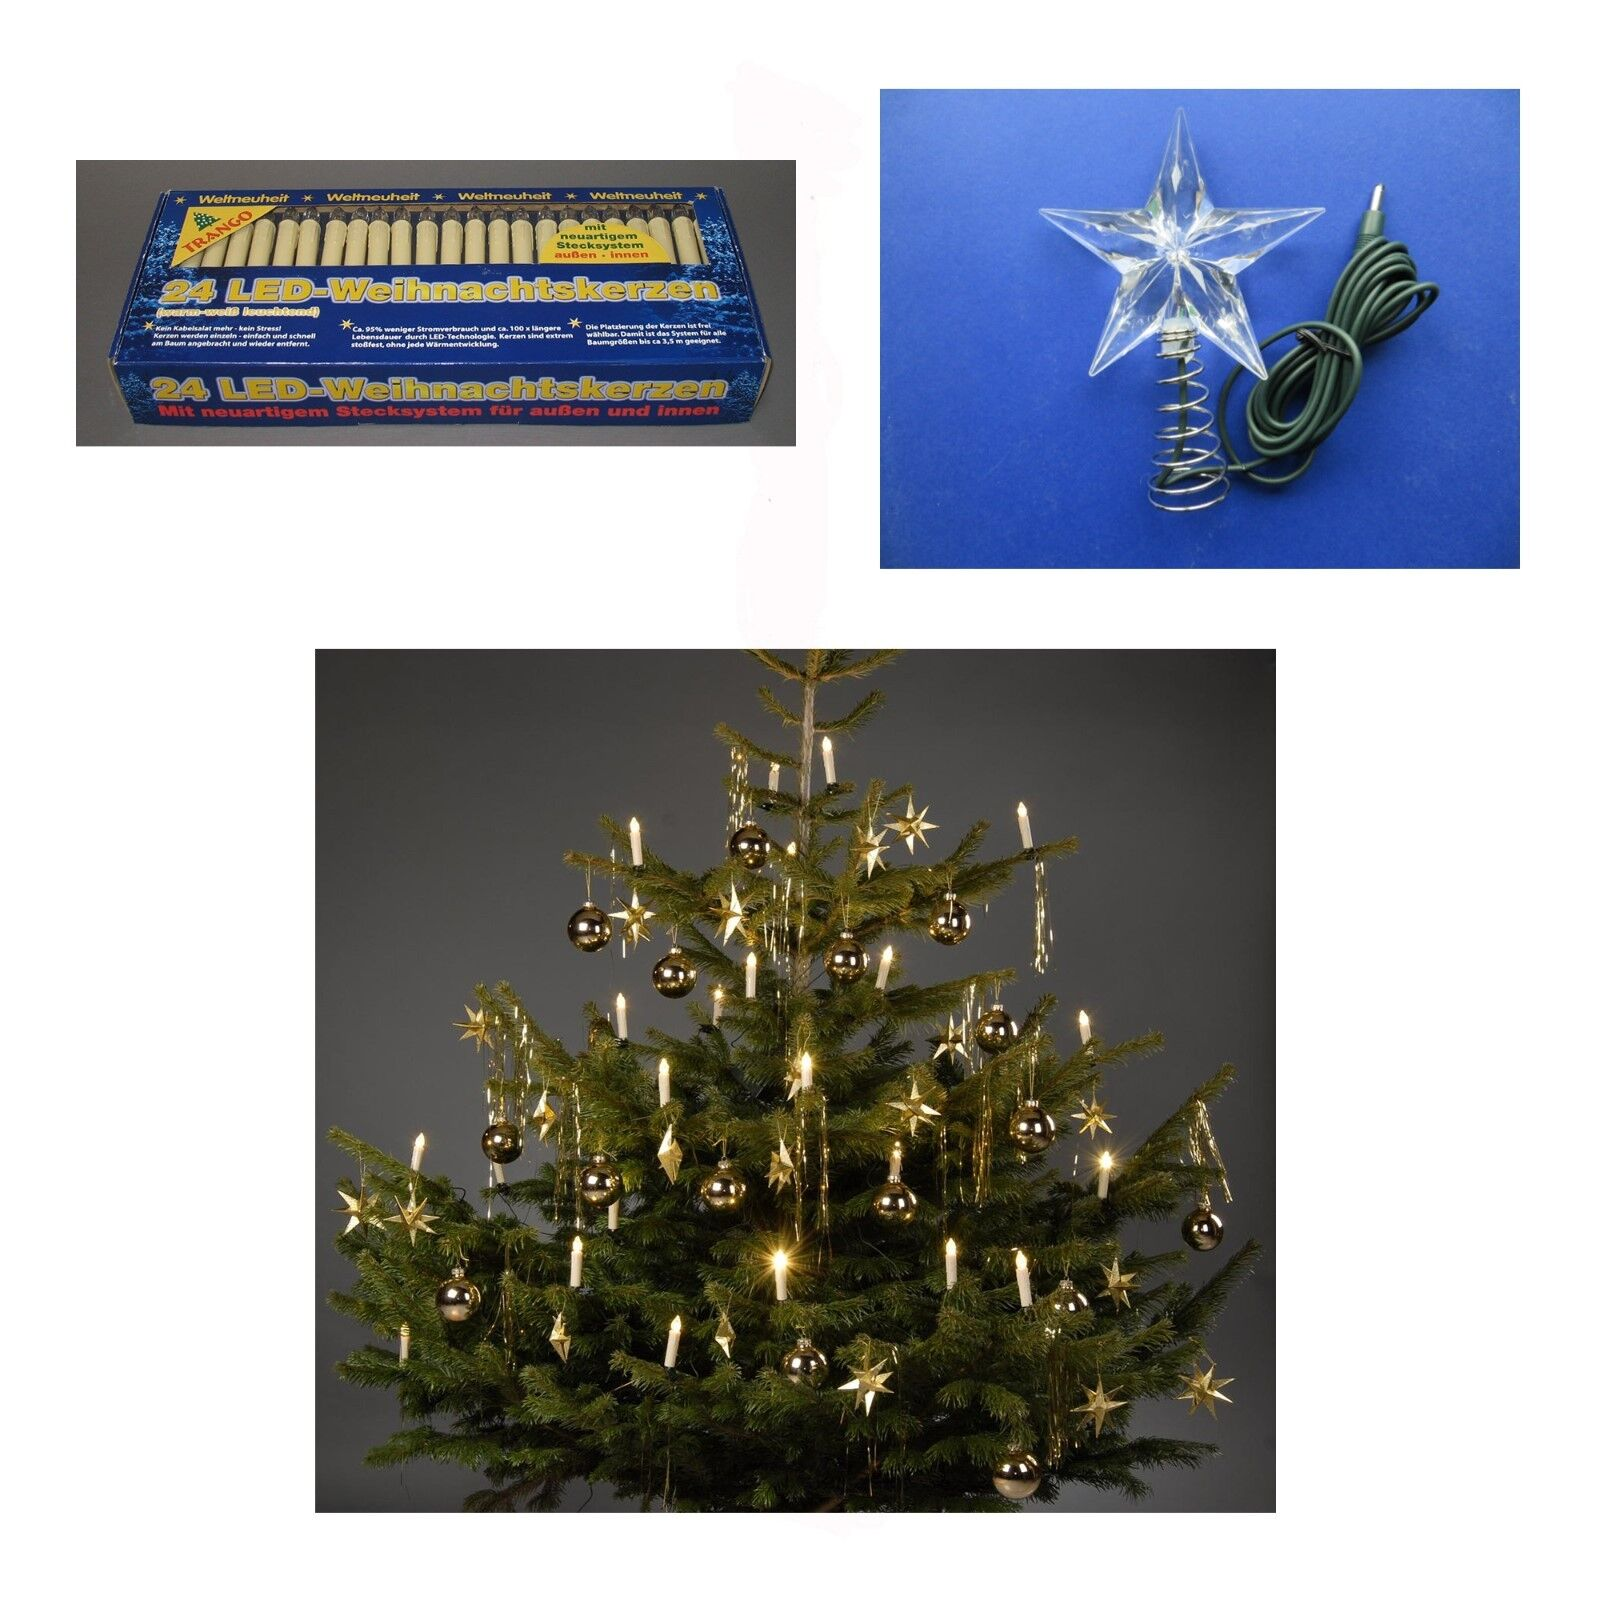 2x 24 Led Catena Luci Natale Stelle Candele per Alberi a Nuovo